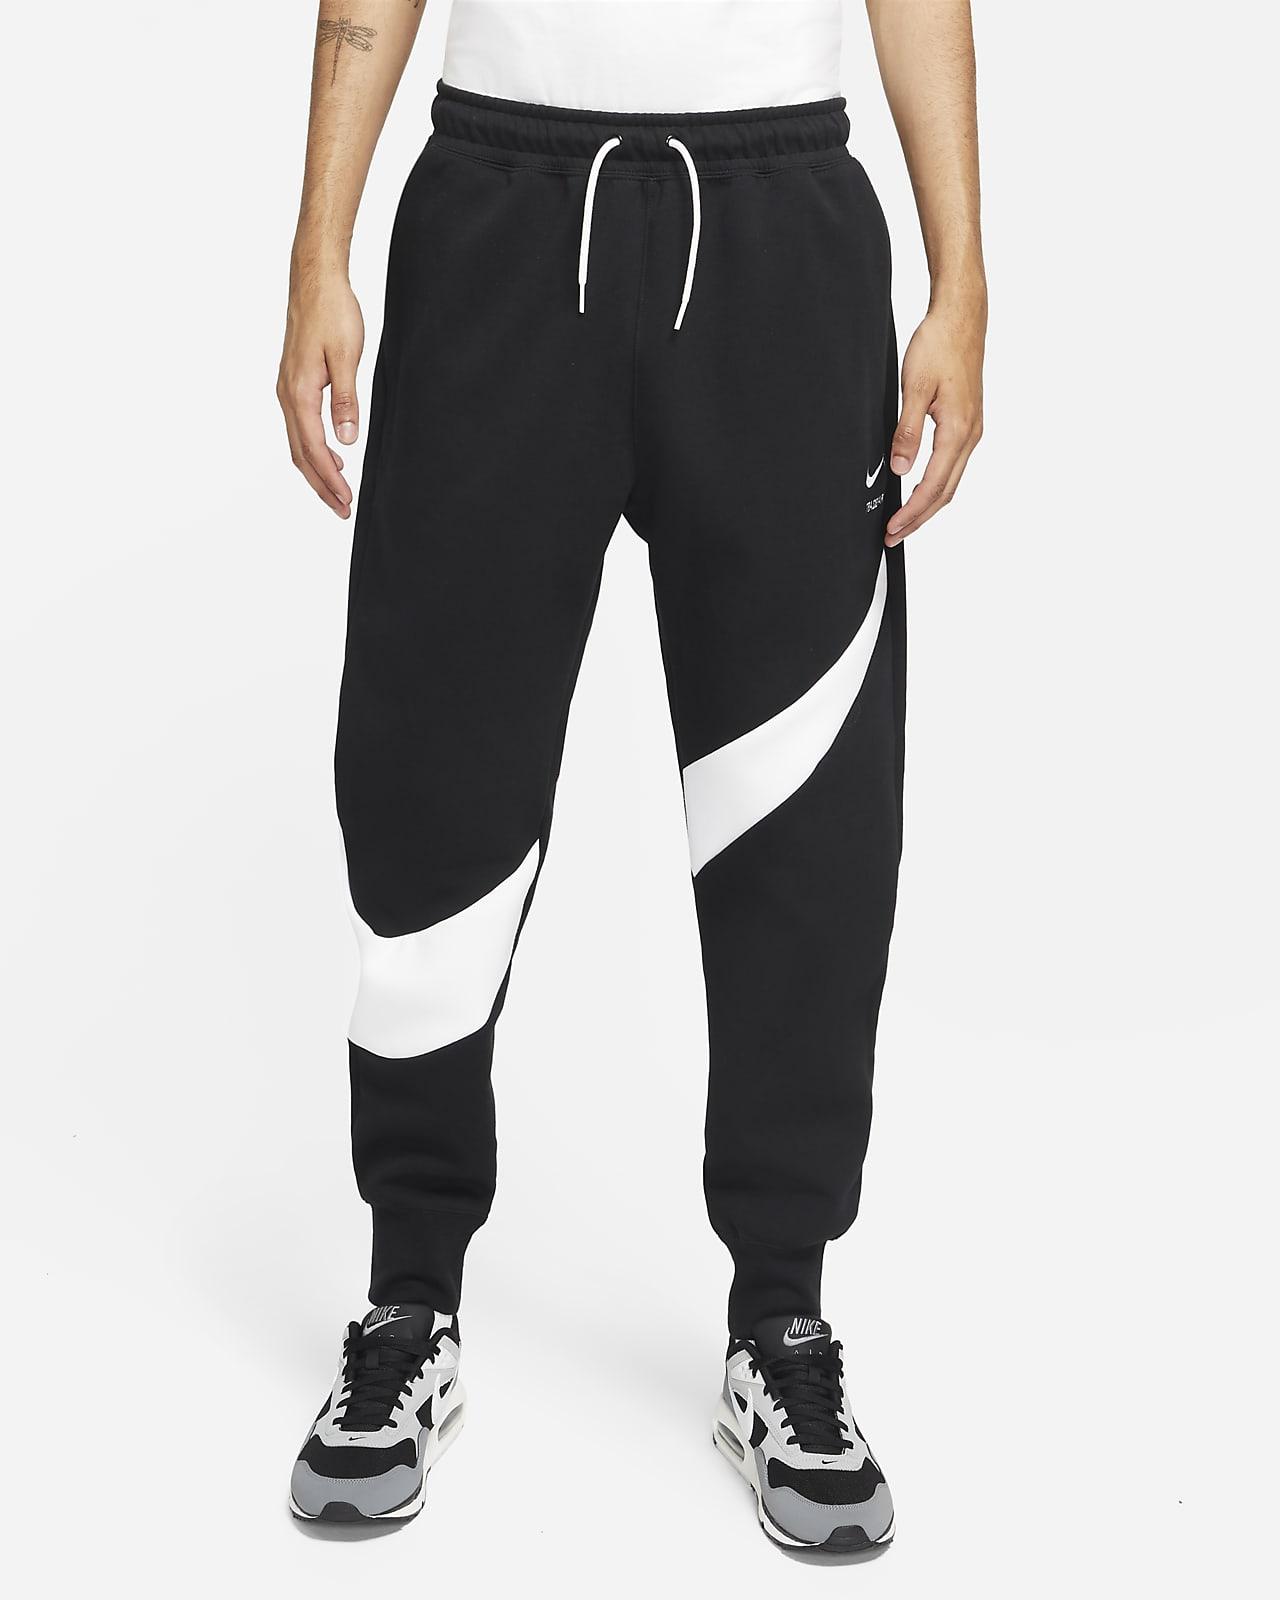 Calças Nike Sportswear Swoosh Tech Fleece para homem